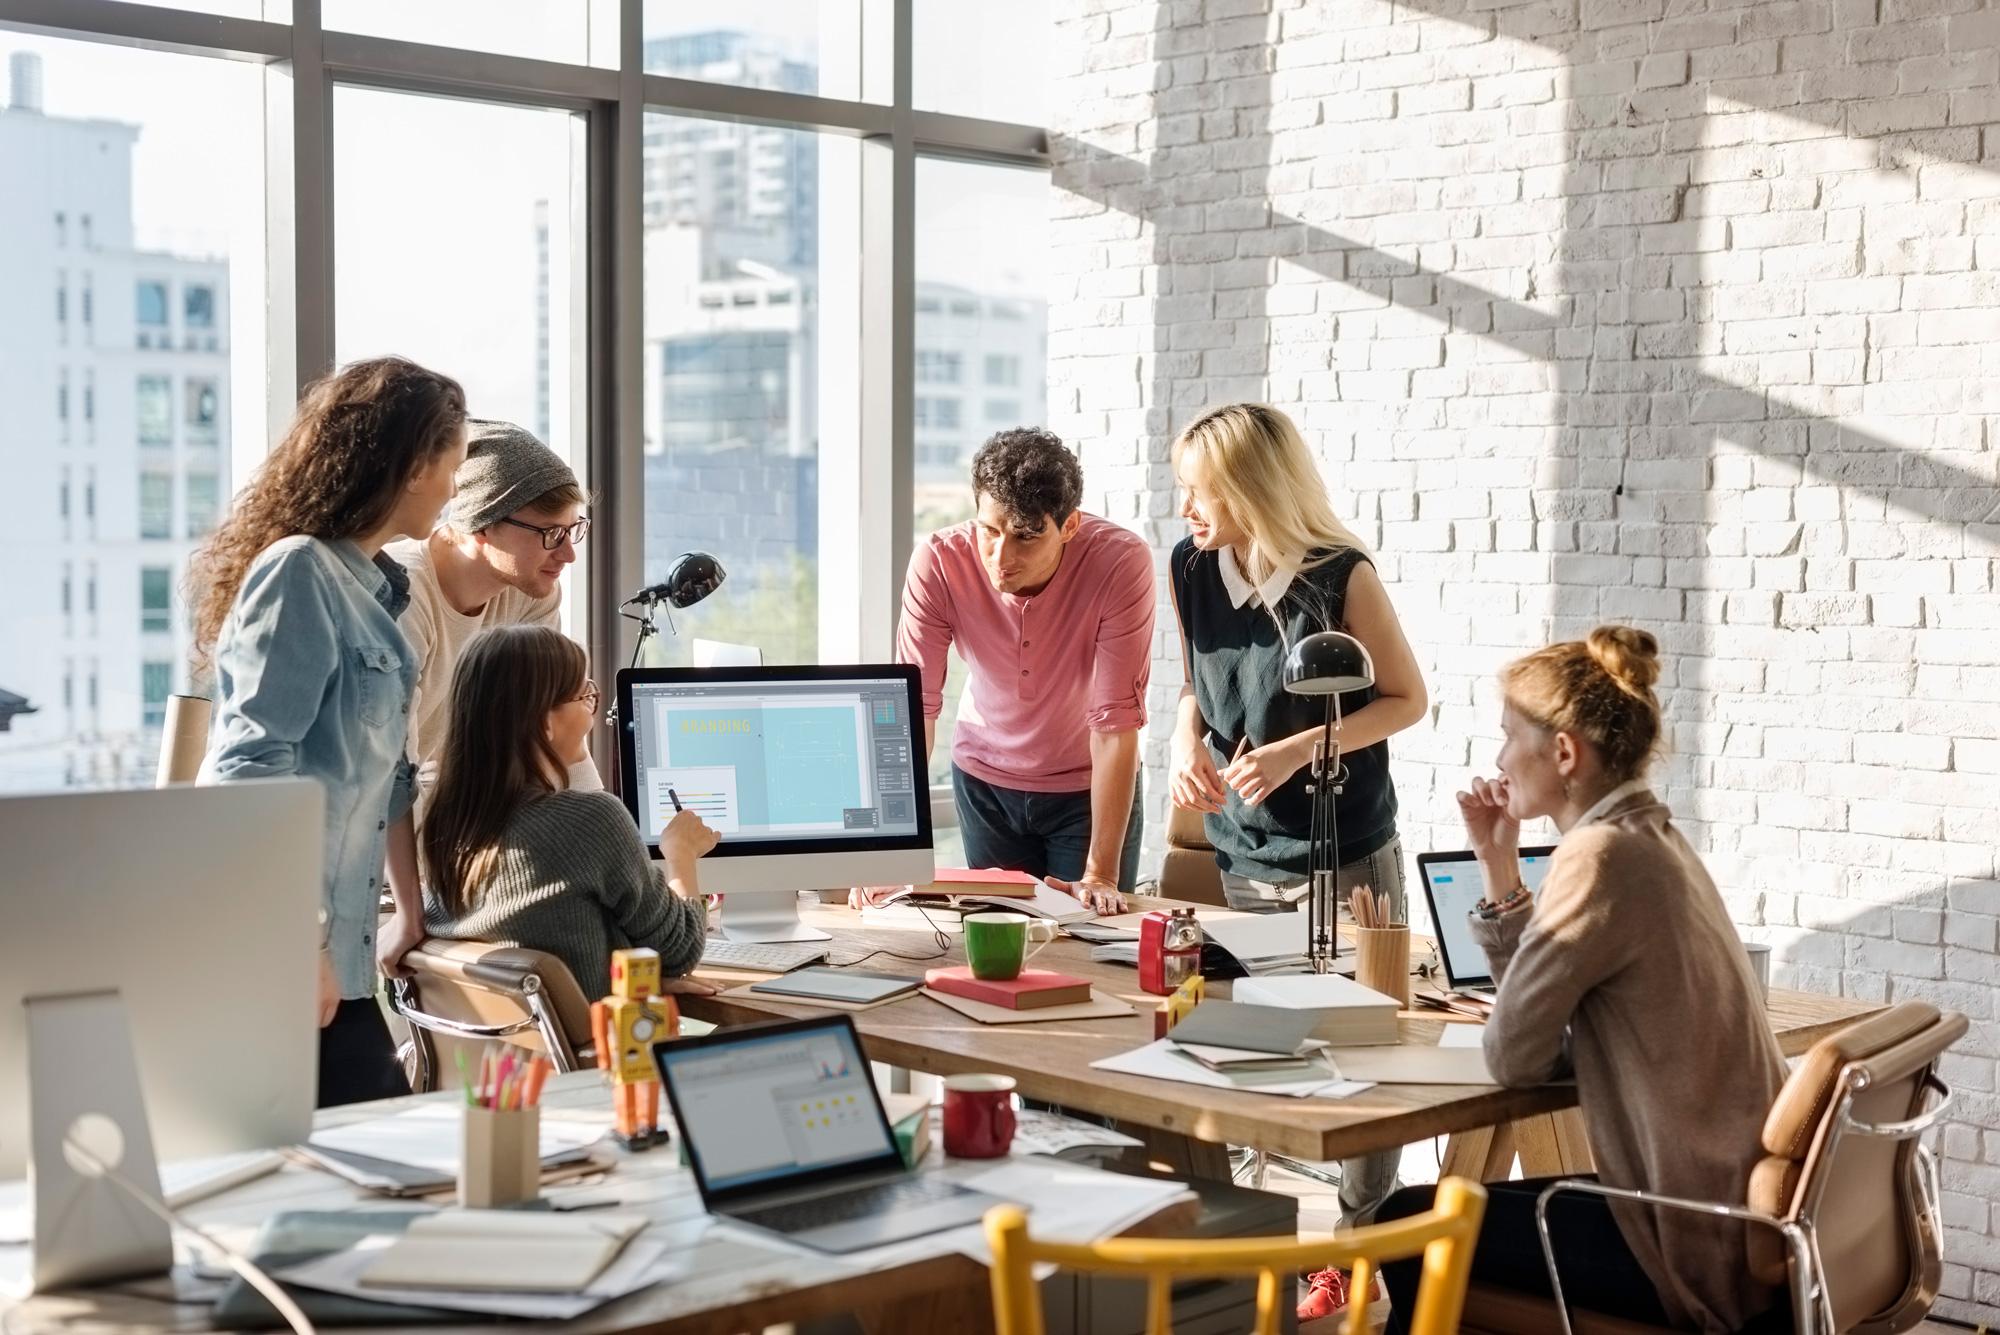 SM_teamwork-discussion-meeting-brainstorming-start-P59ACVM.jpg